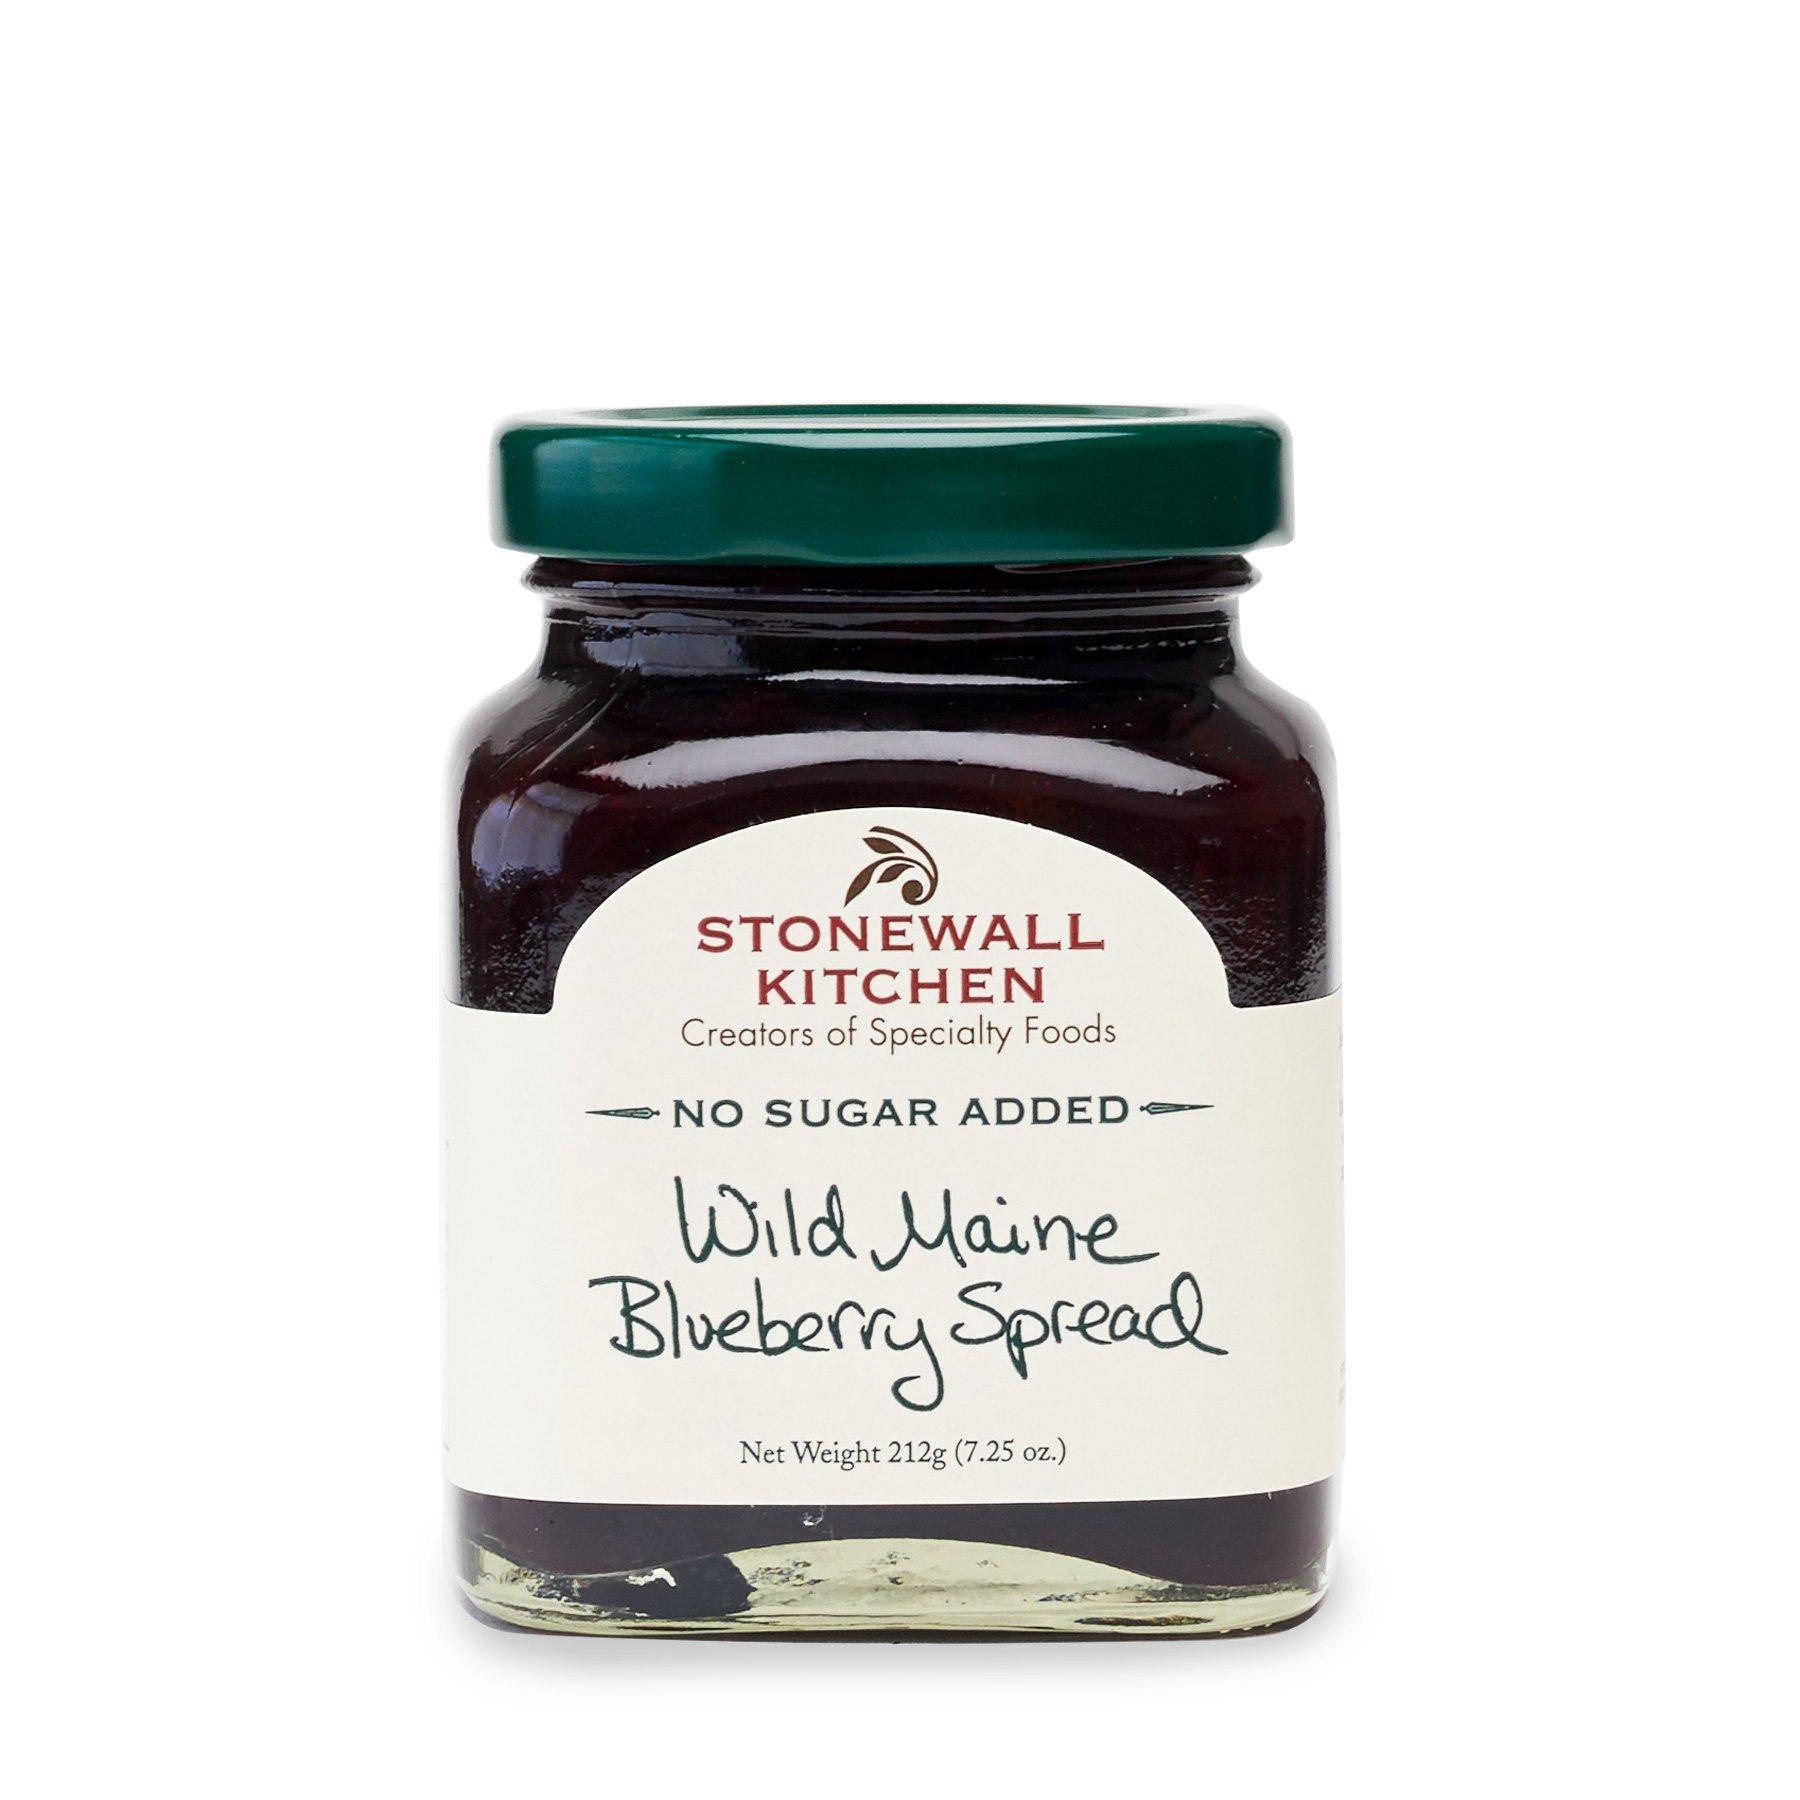 Stonewall Kitchen Wild Maine Spread, Blueberry, 7.5 Ounce